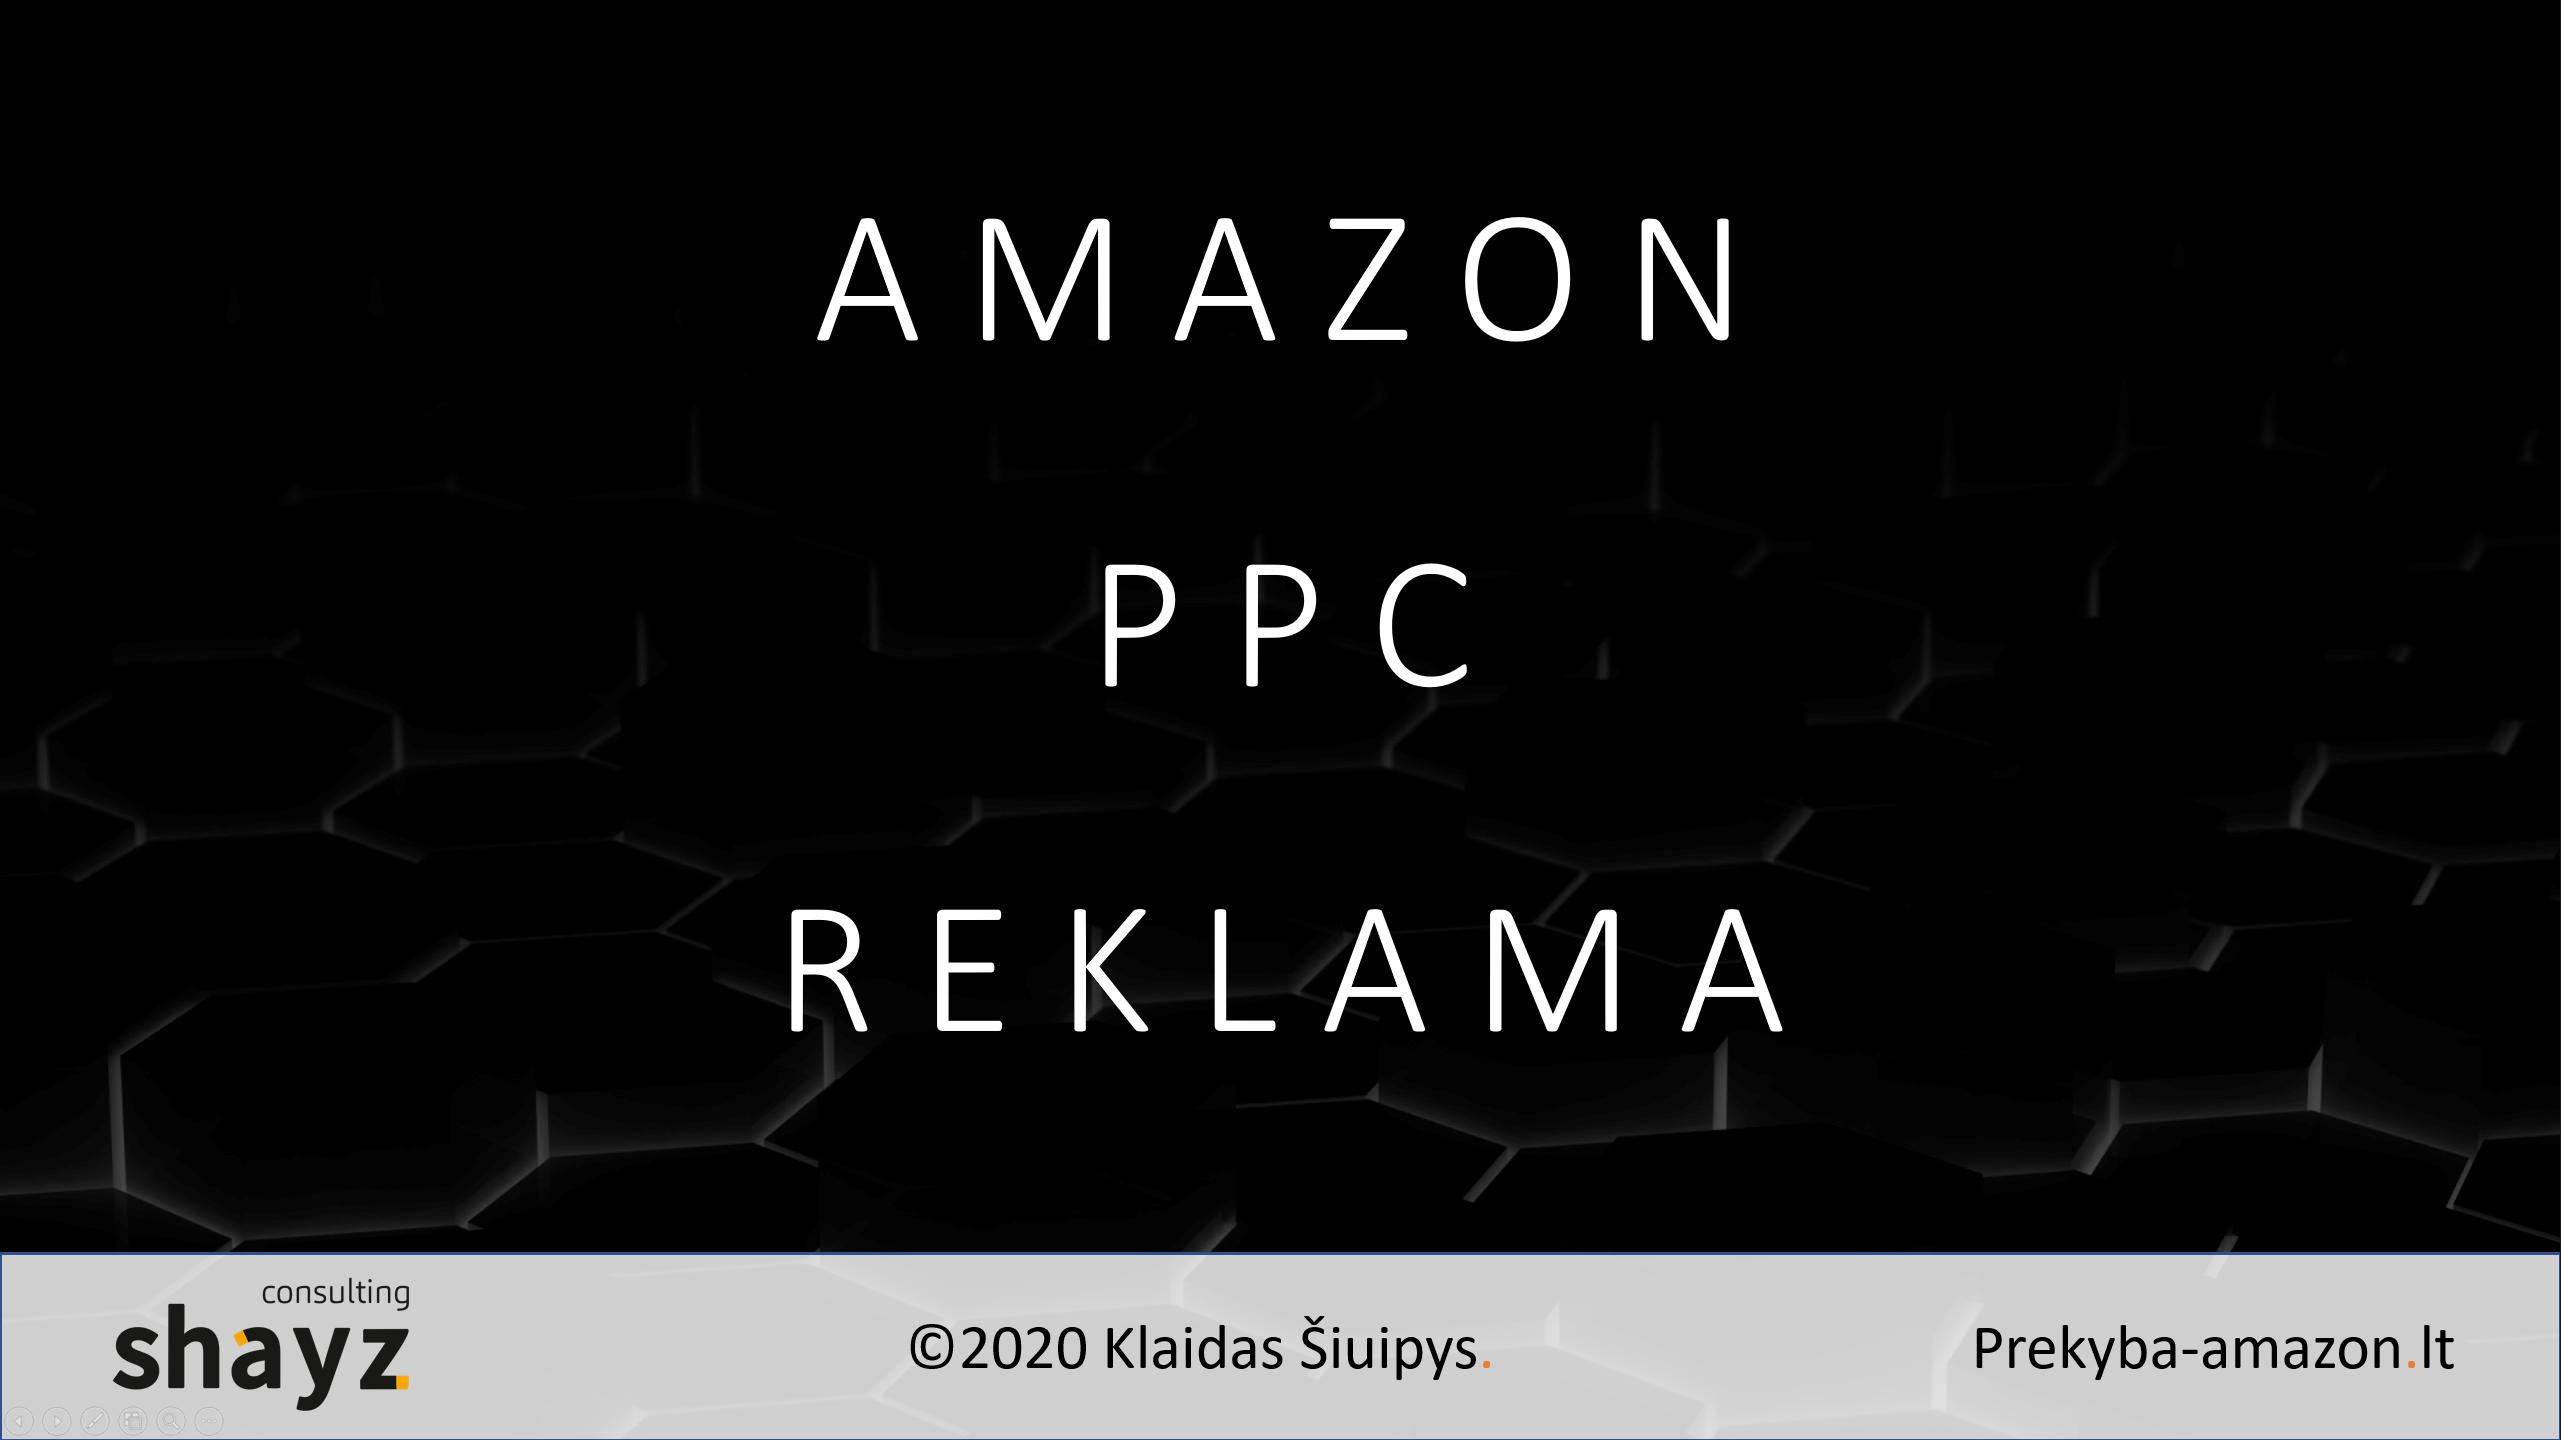 Amazon PPC reklama